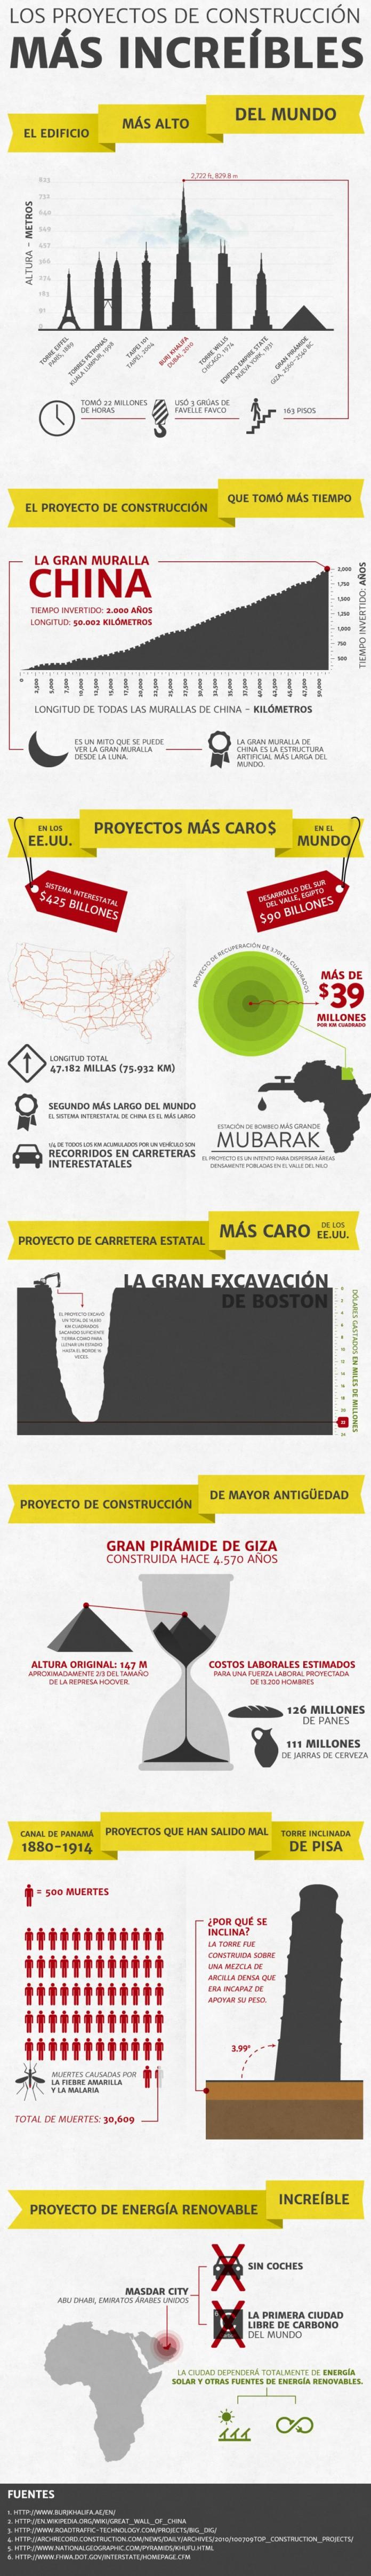 infografia construcciones increibles